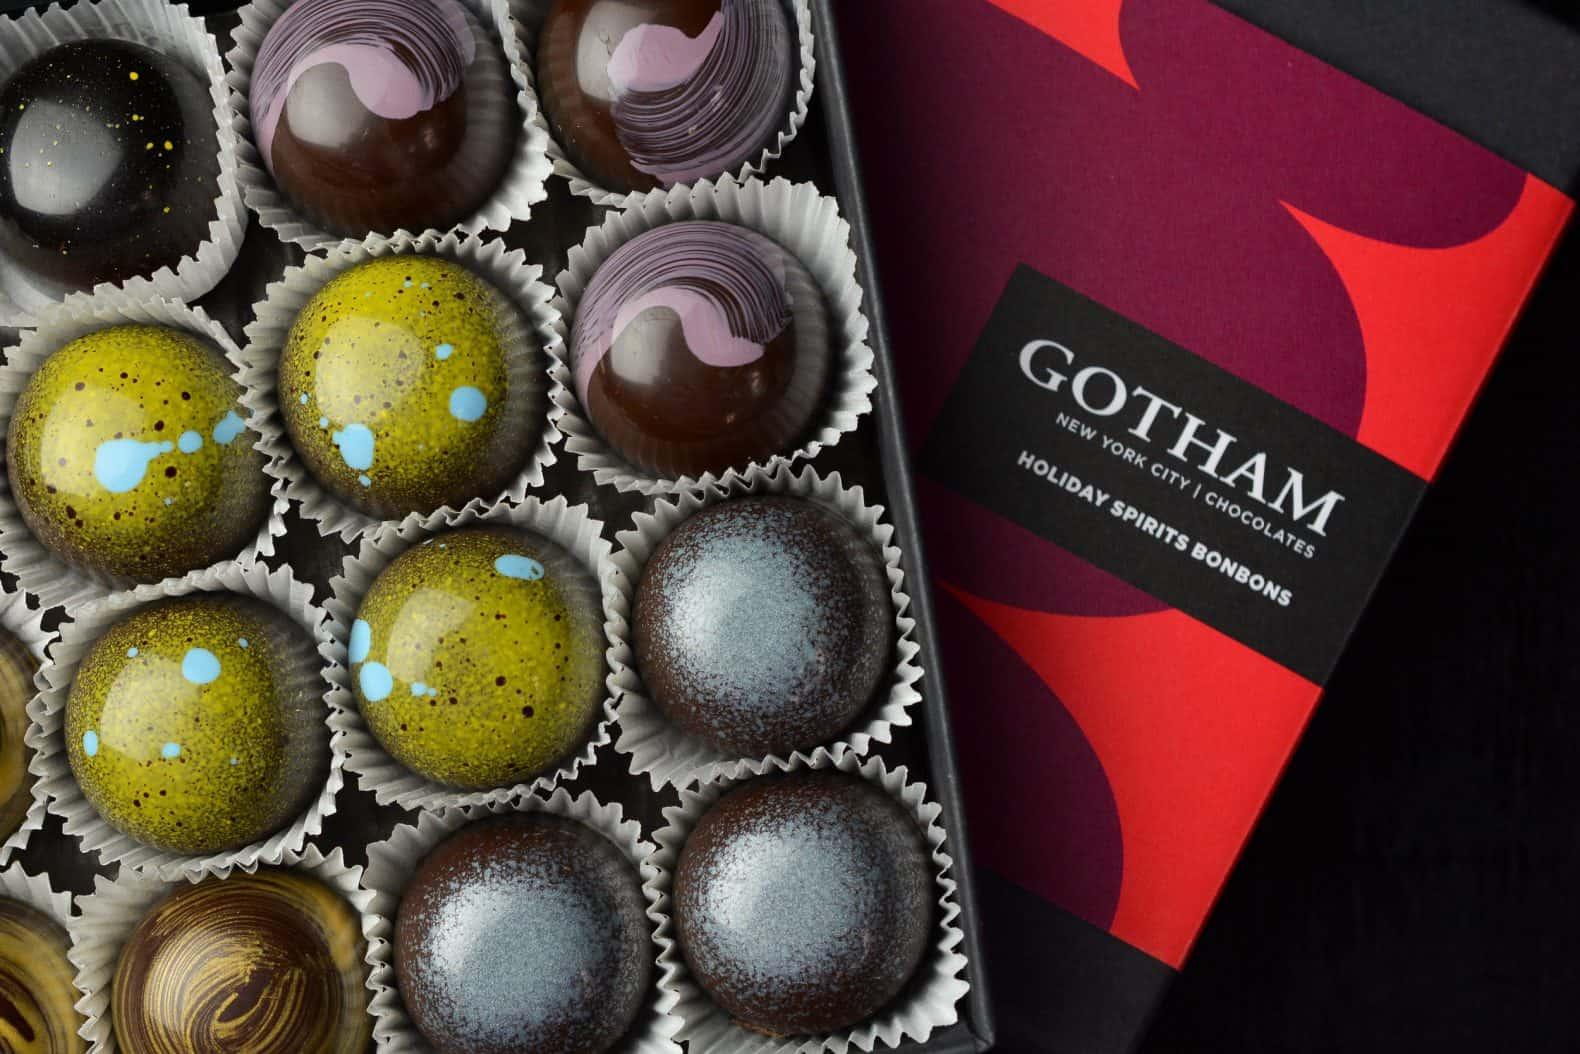 GOTHAM CHOCOLATES